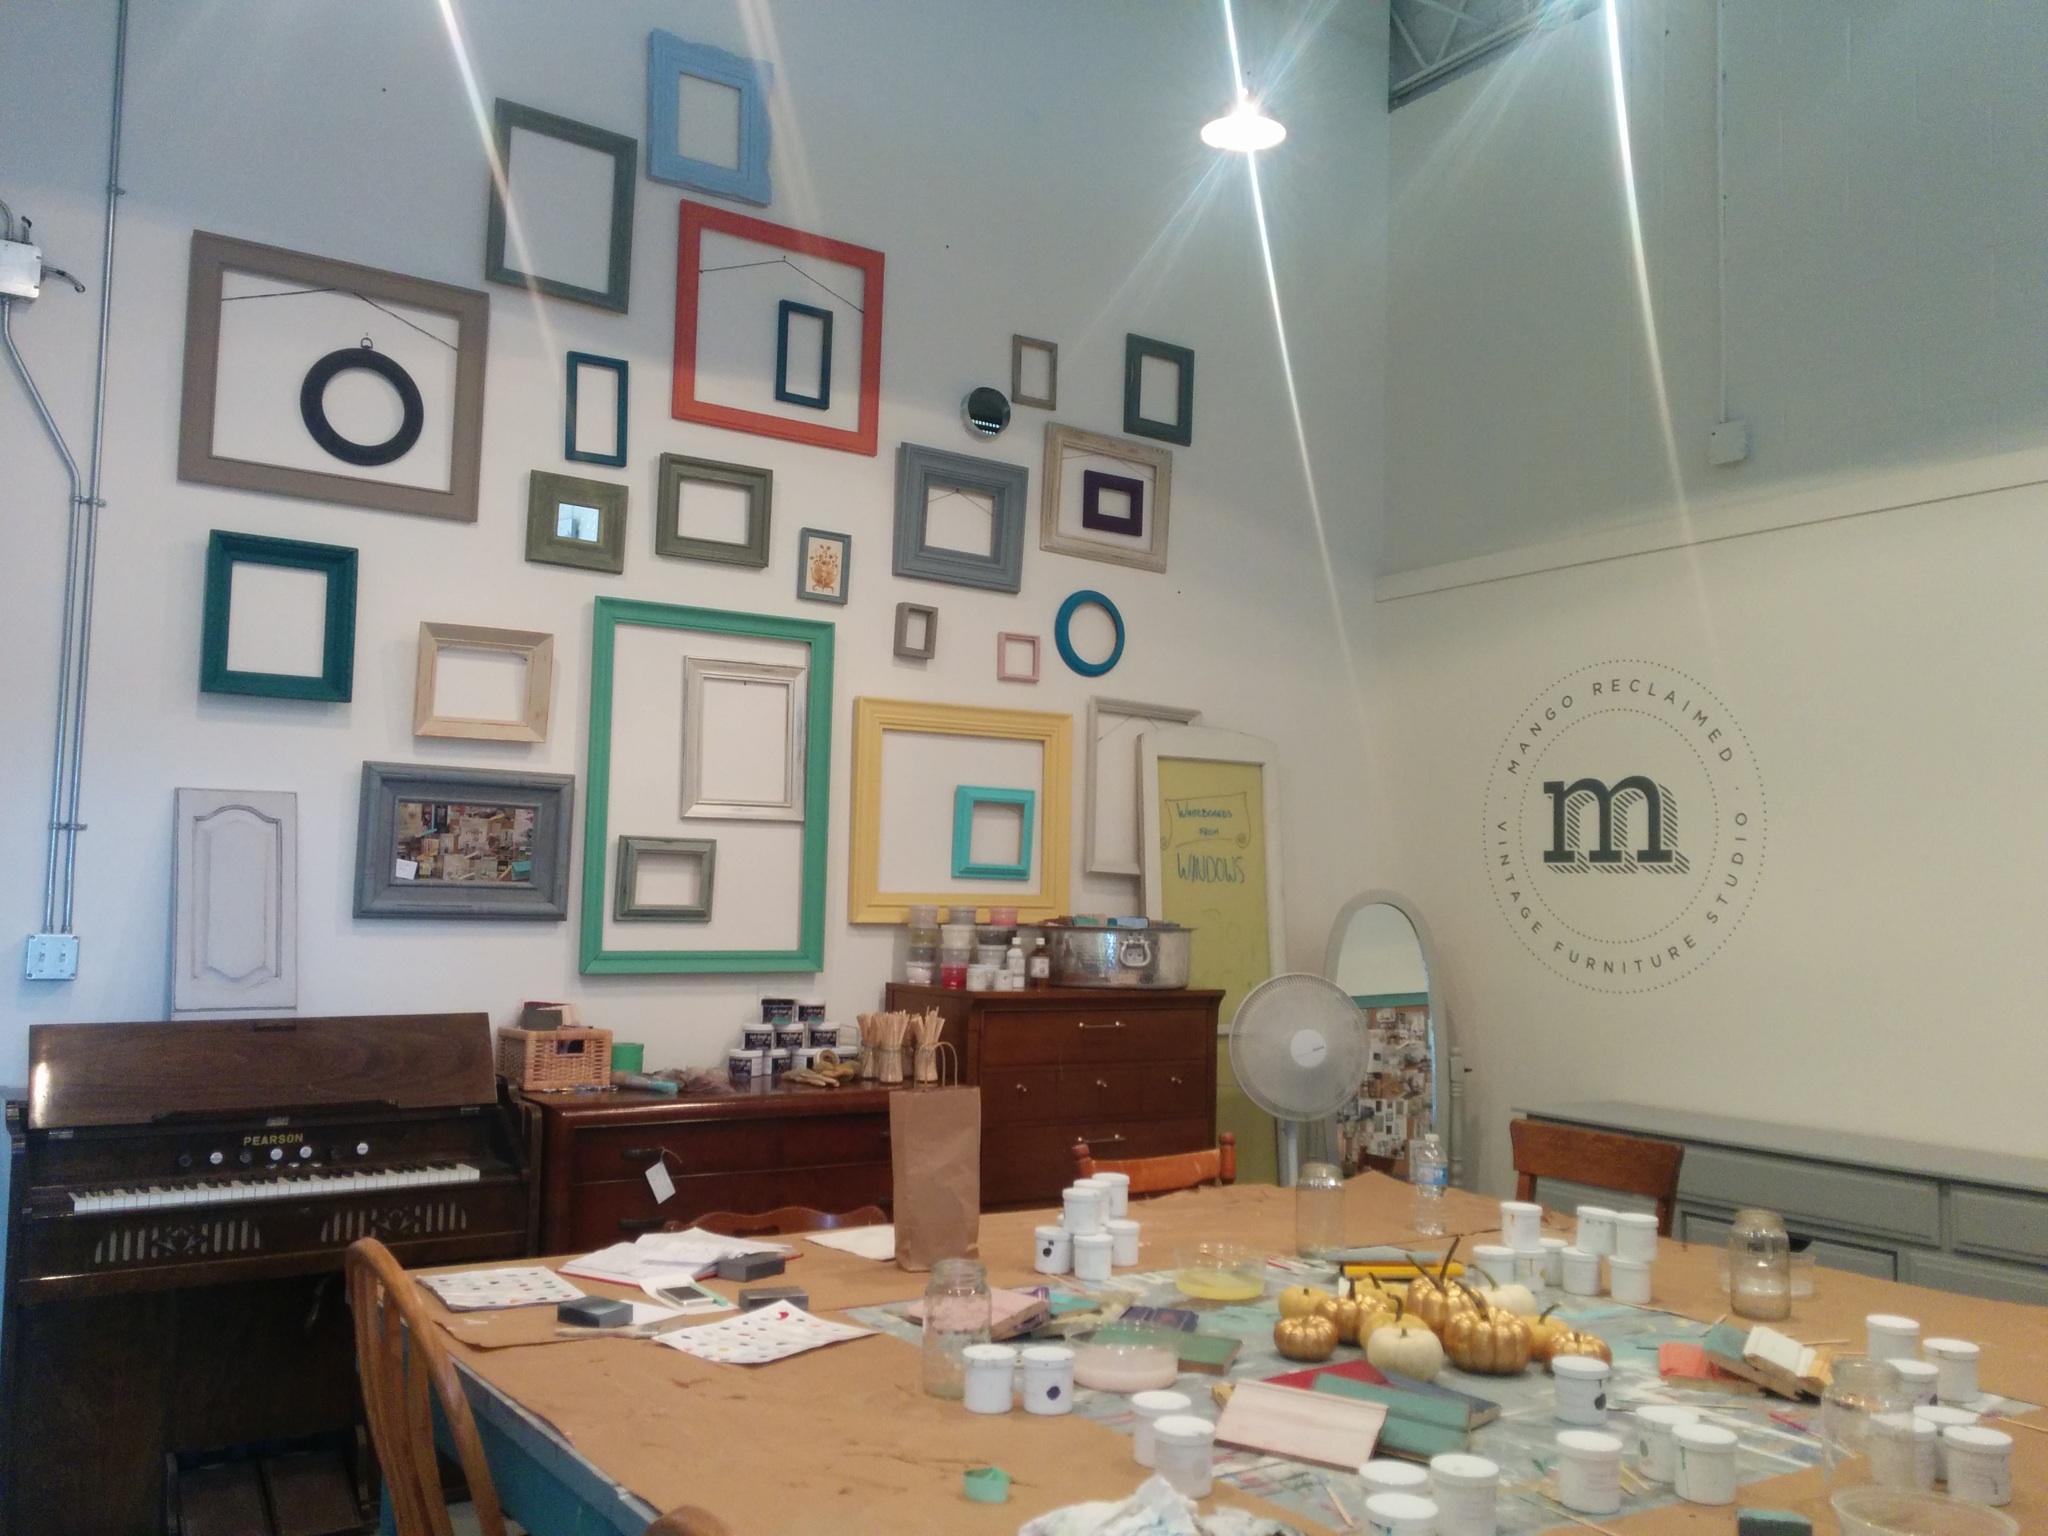 Merchant Monday with Mango Reclaimed 7